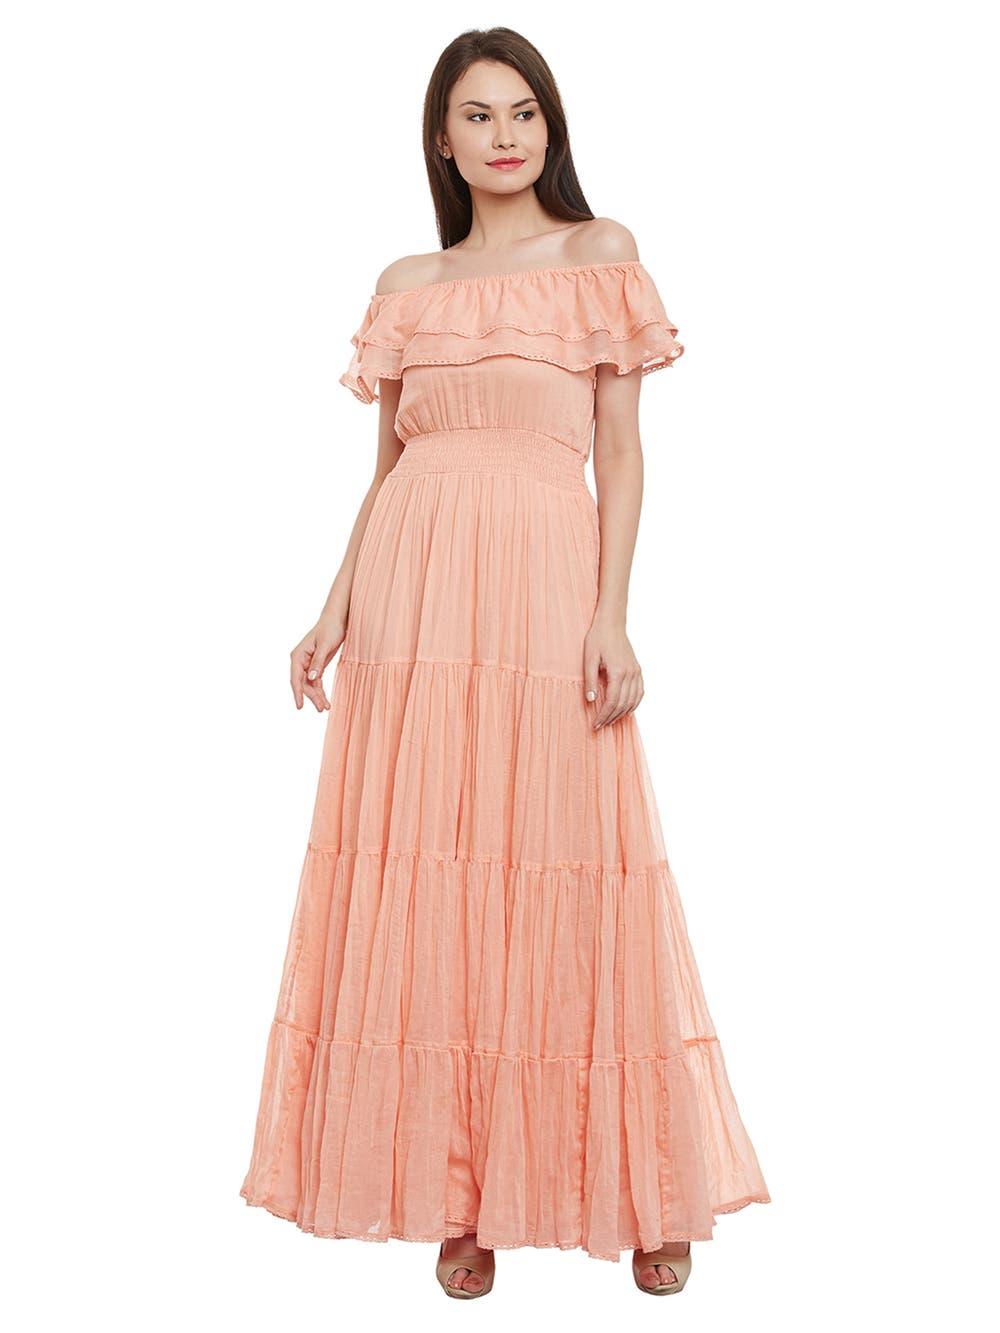 Peach Off-Shoulder Long Dress